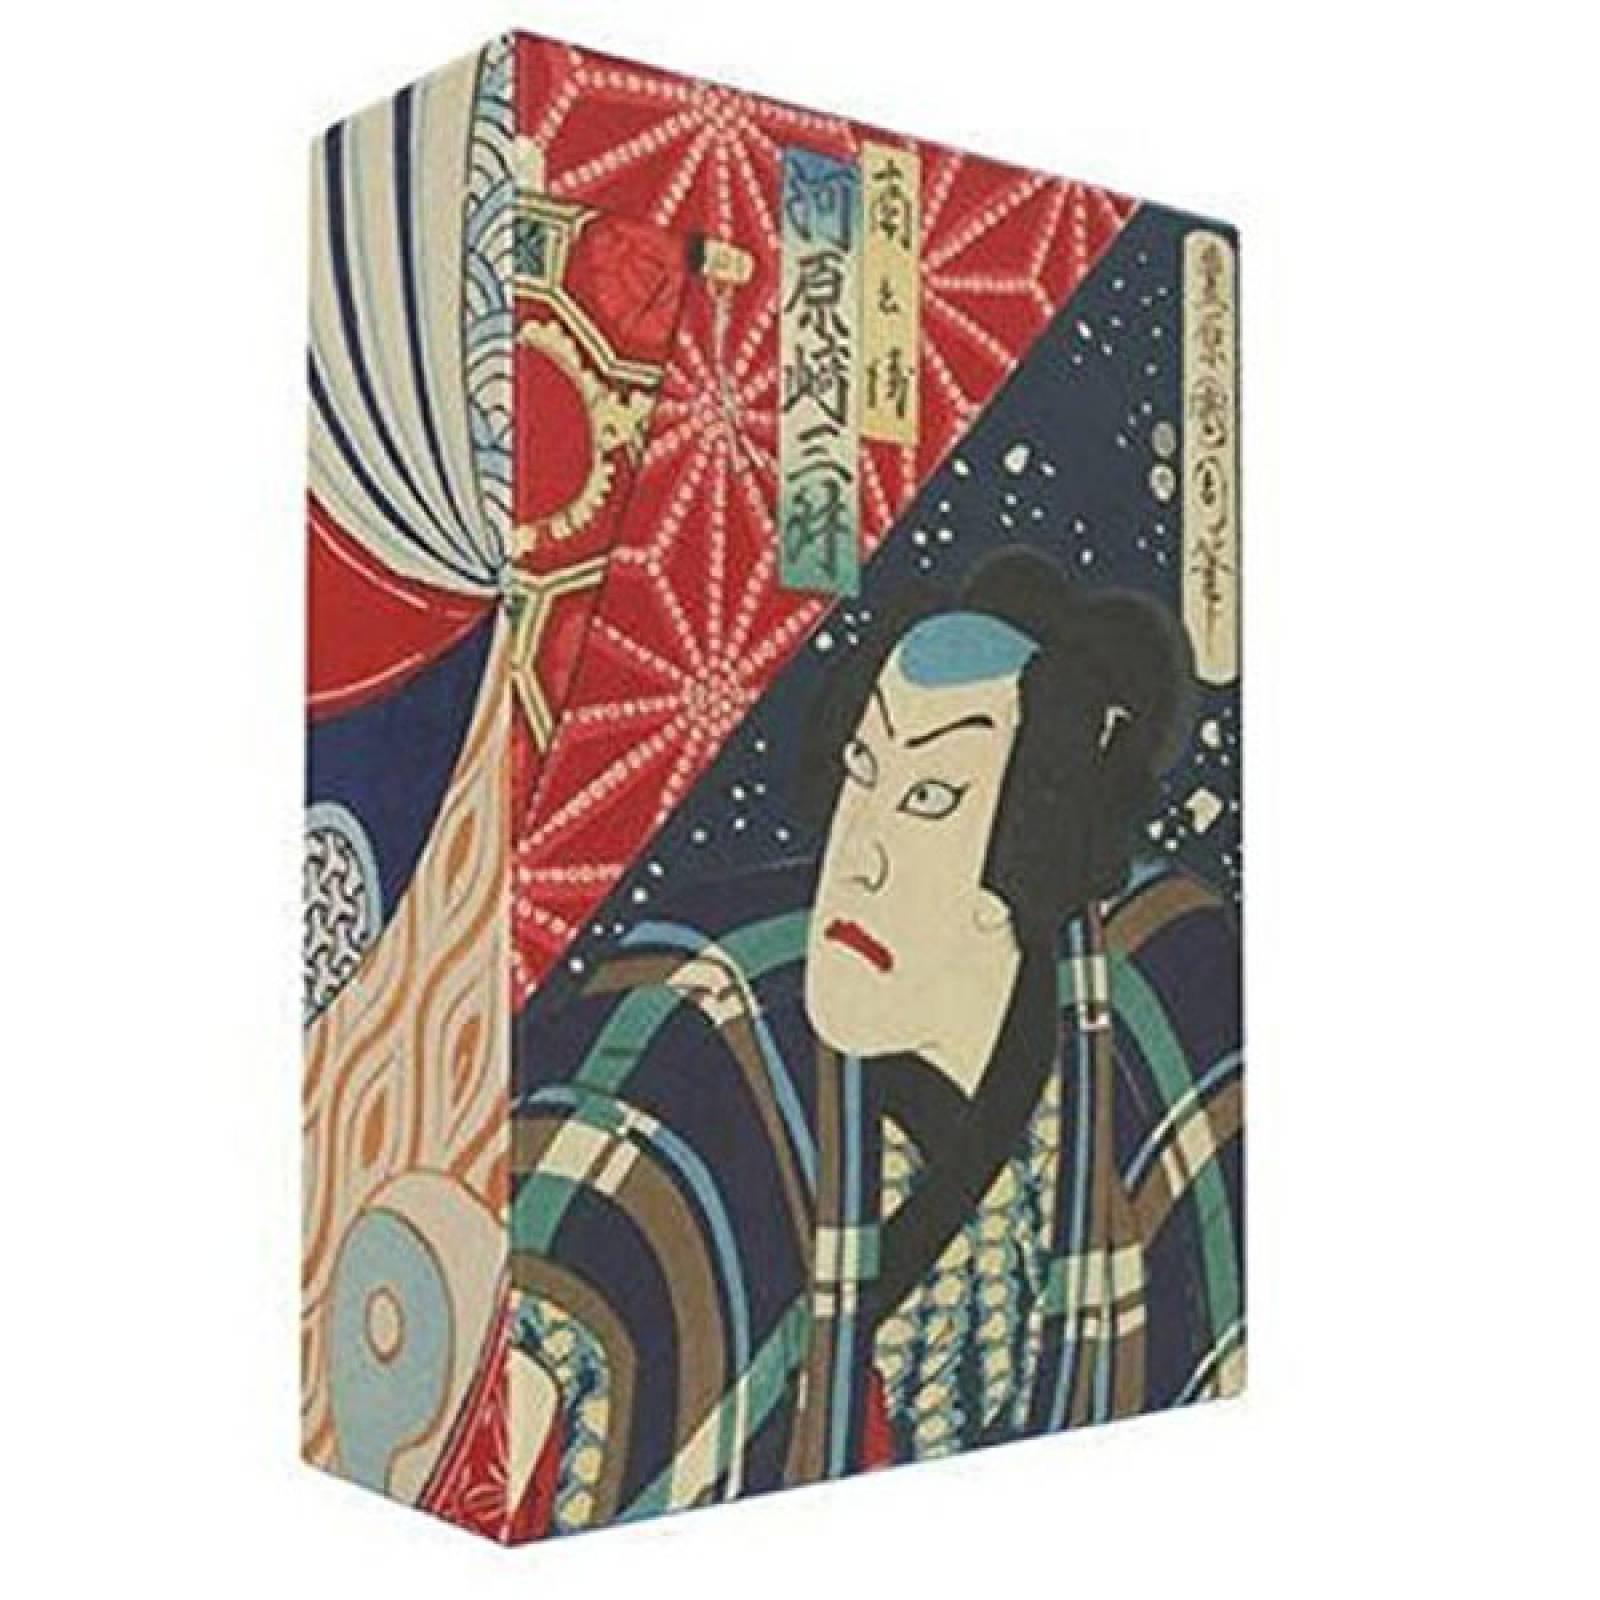 Box Of 100 Japanese Woodblock Print Postcards